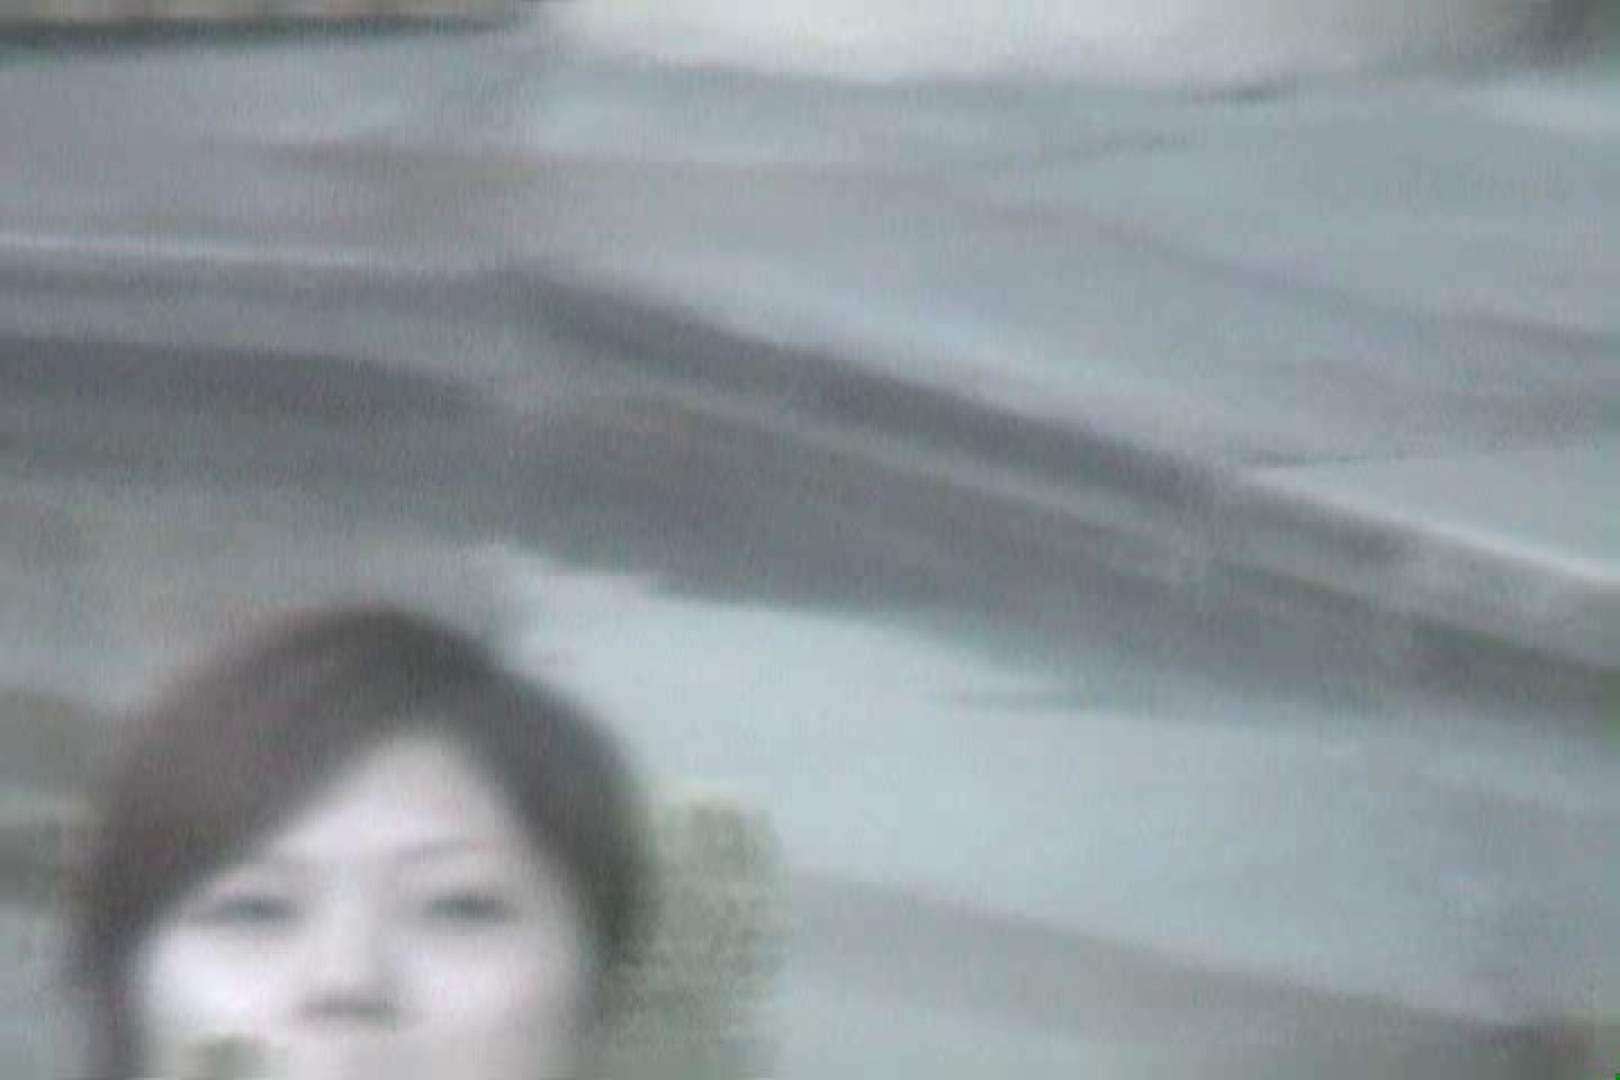 Aquaな露天風呂Vol.609 盗撮シリーズ   露天風呂編  107PIX 75